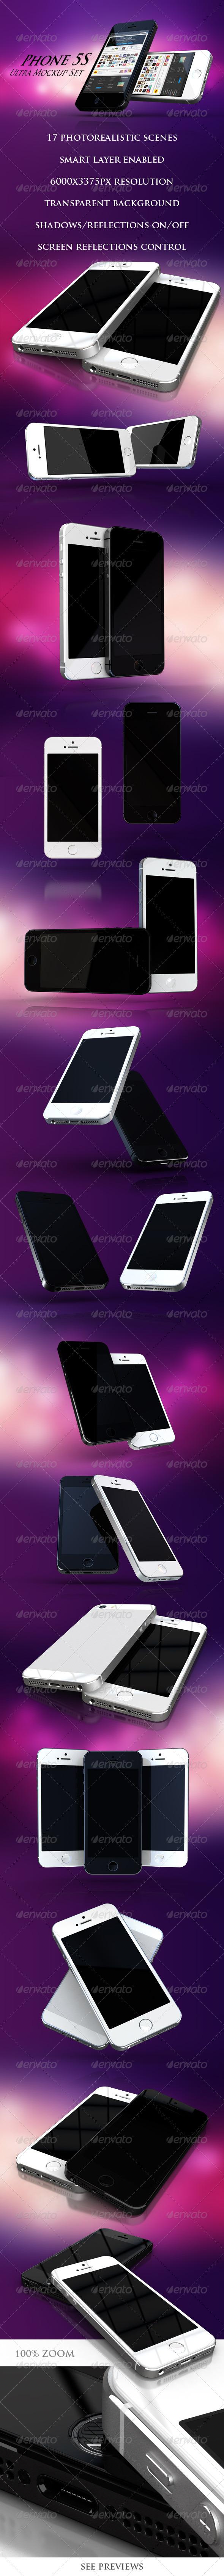 Phone 5S Ultra Mockup Set - Mobile Displays